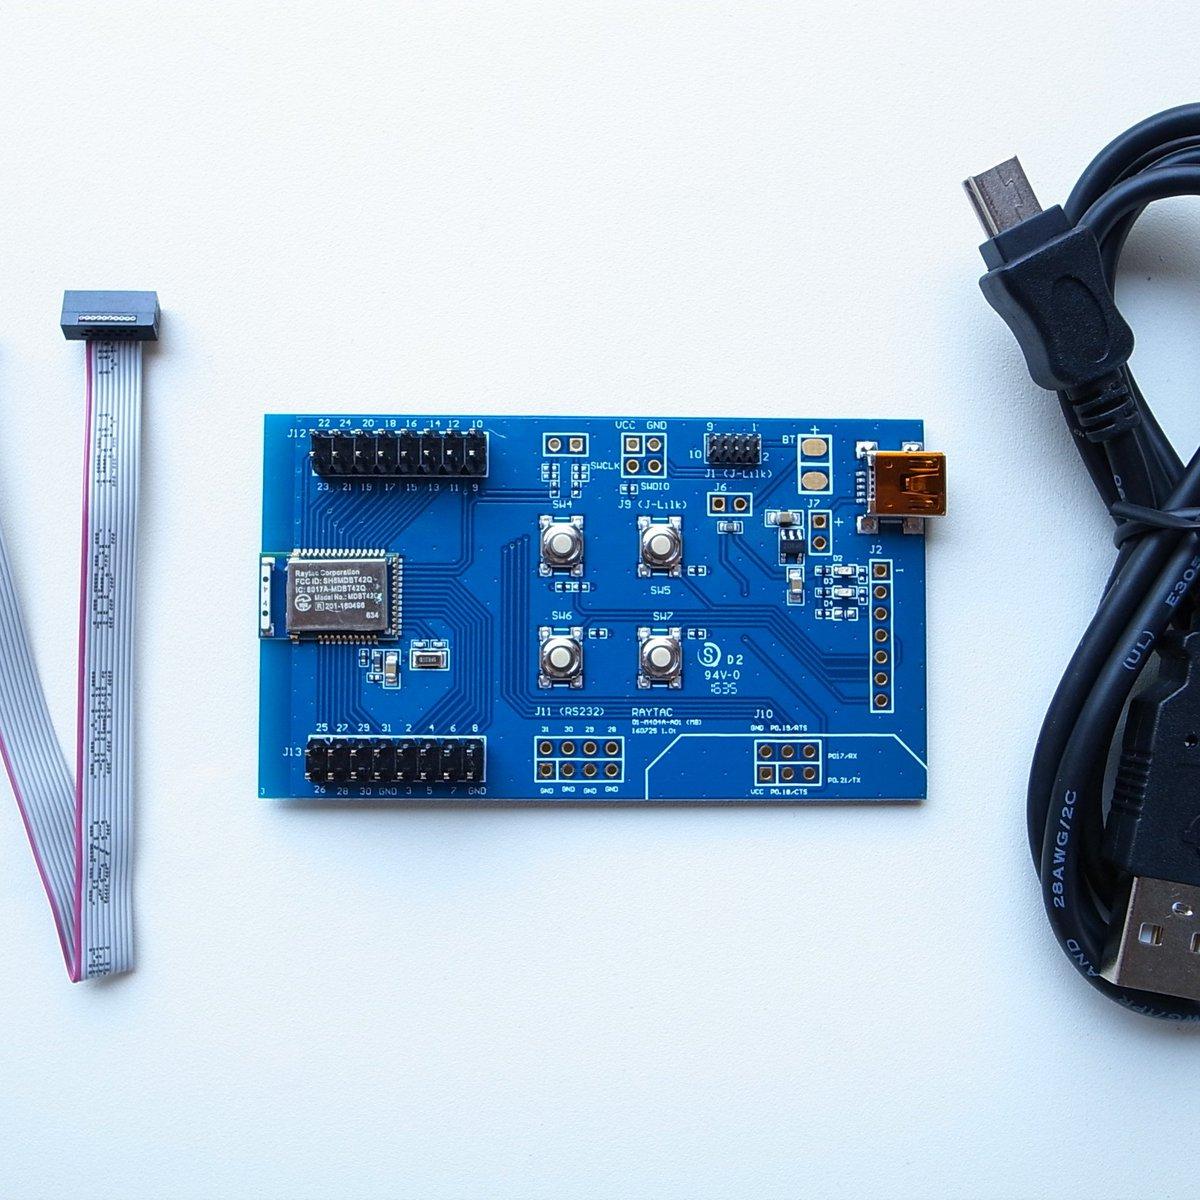 nRF52832 Raytac MDBT42Q Module Demo Board Kit from Nordic